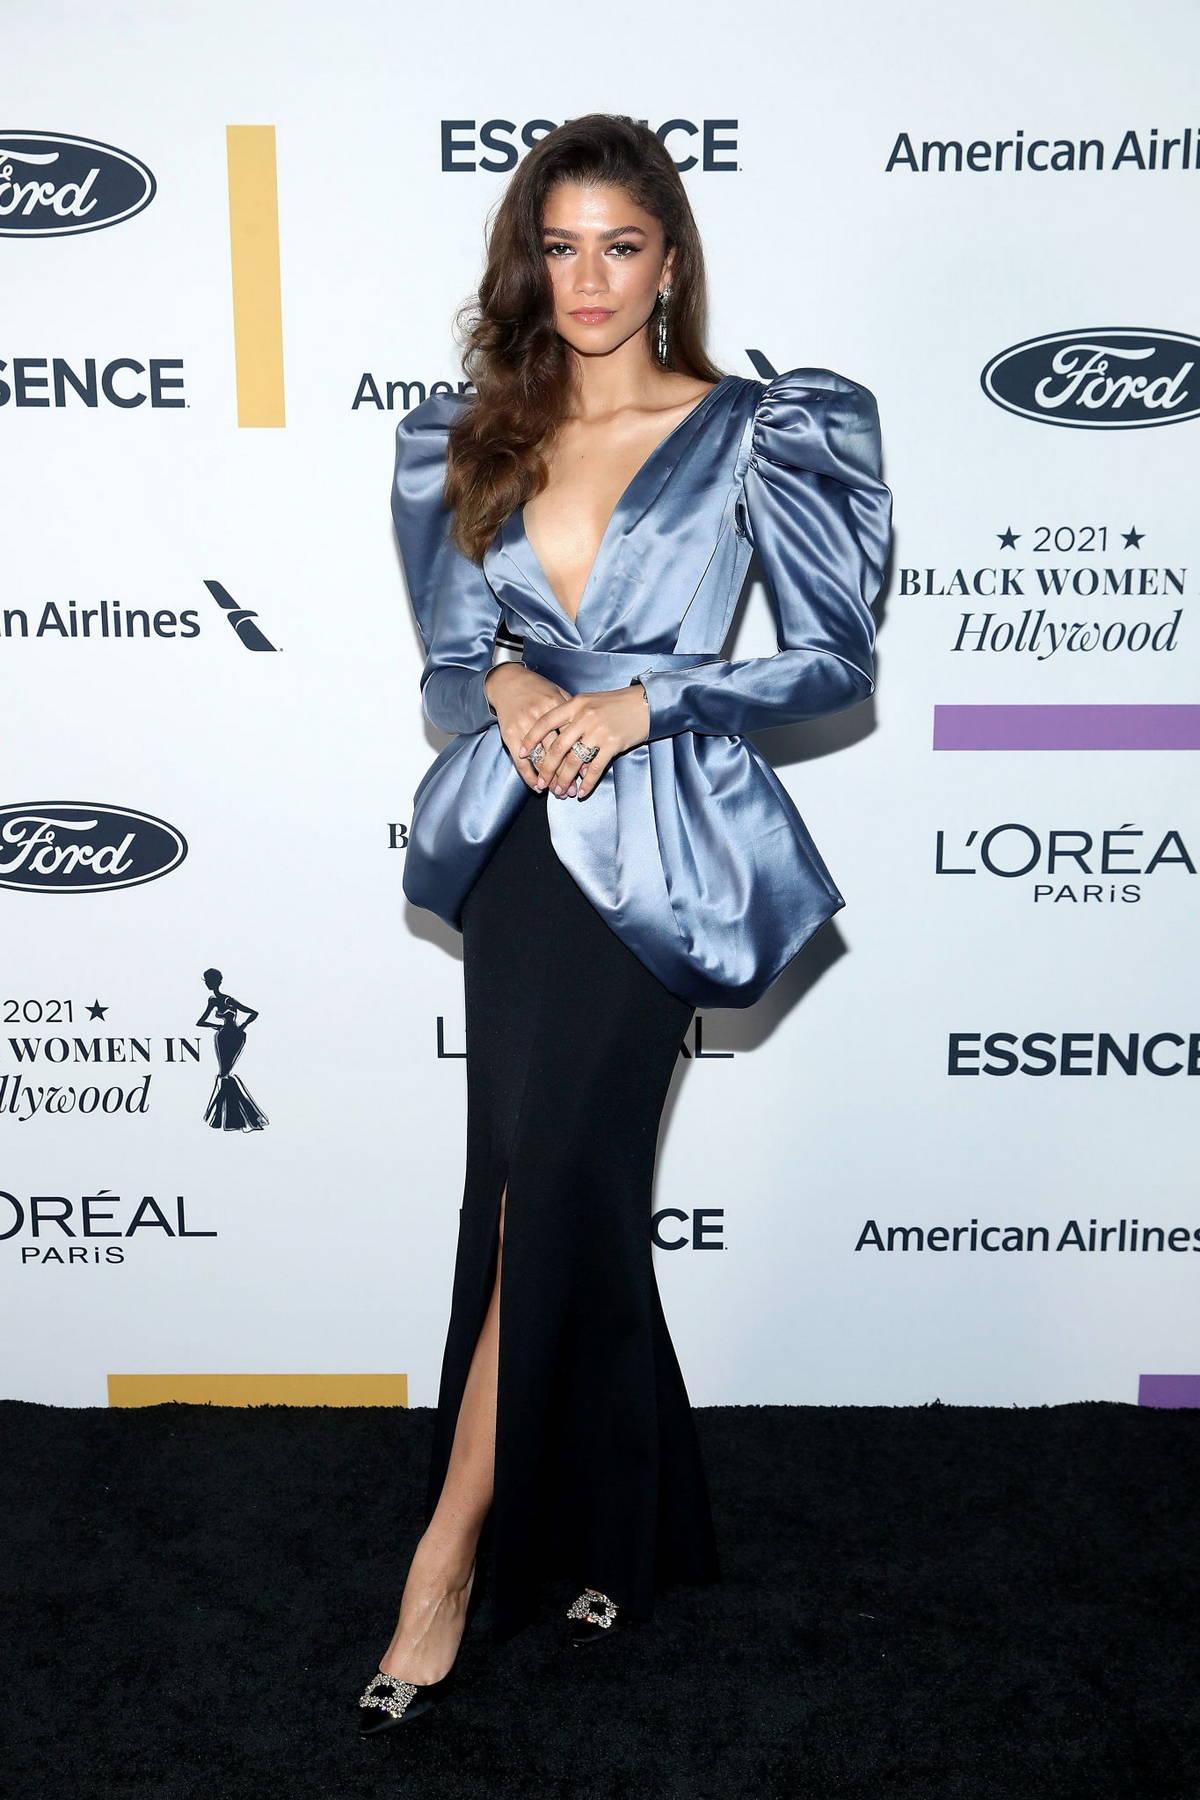 Zendaya attends ESSENCE Black Women in Hollywood Awards in Los Angeles